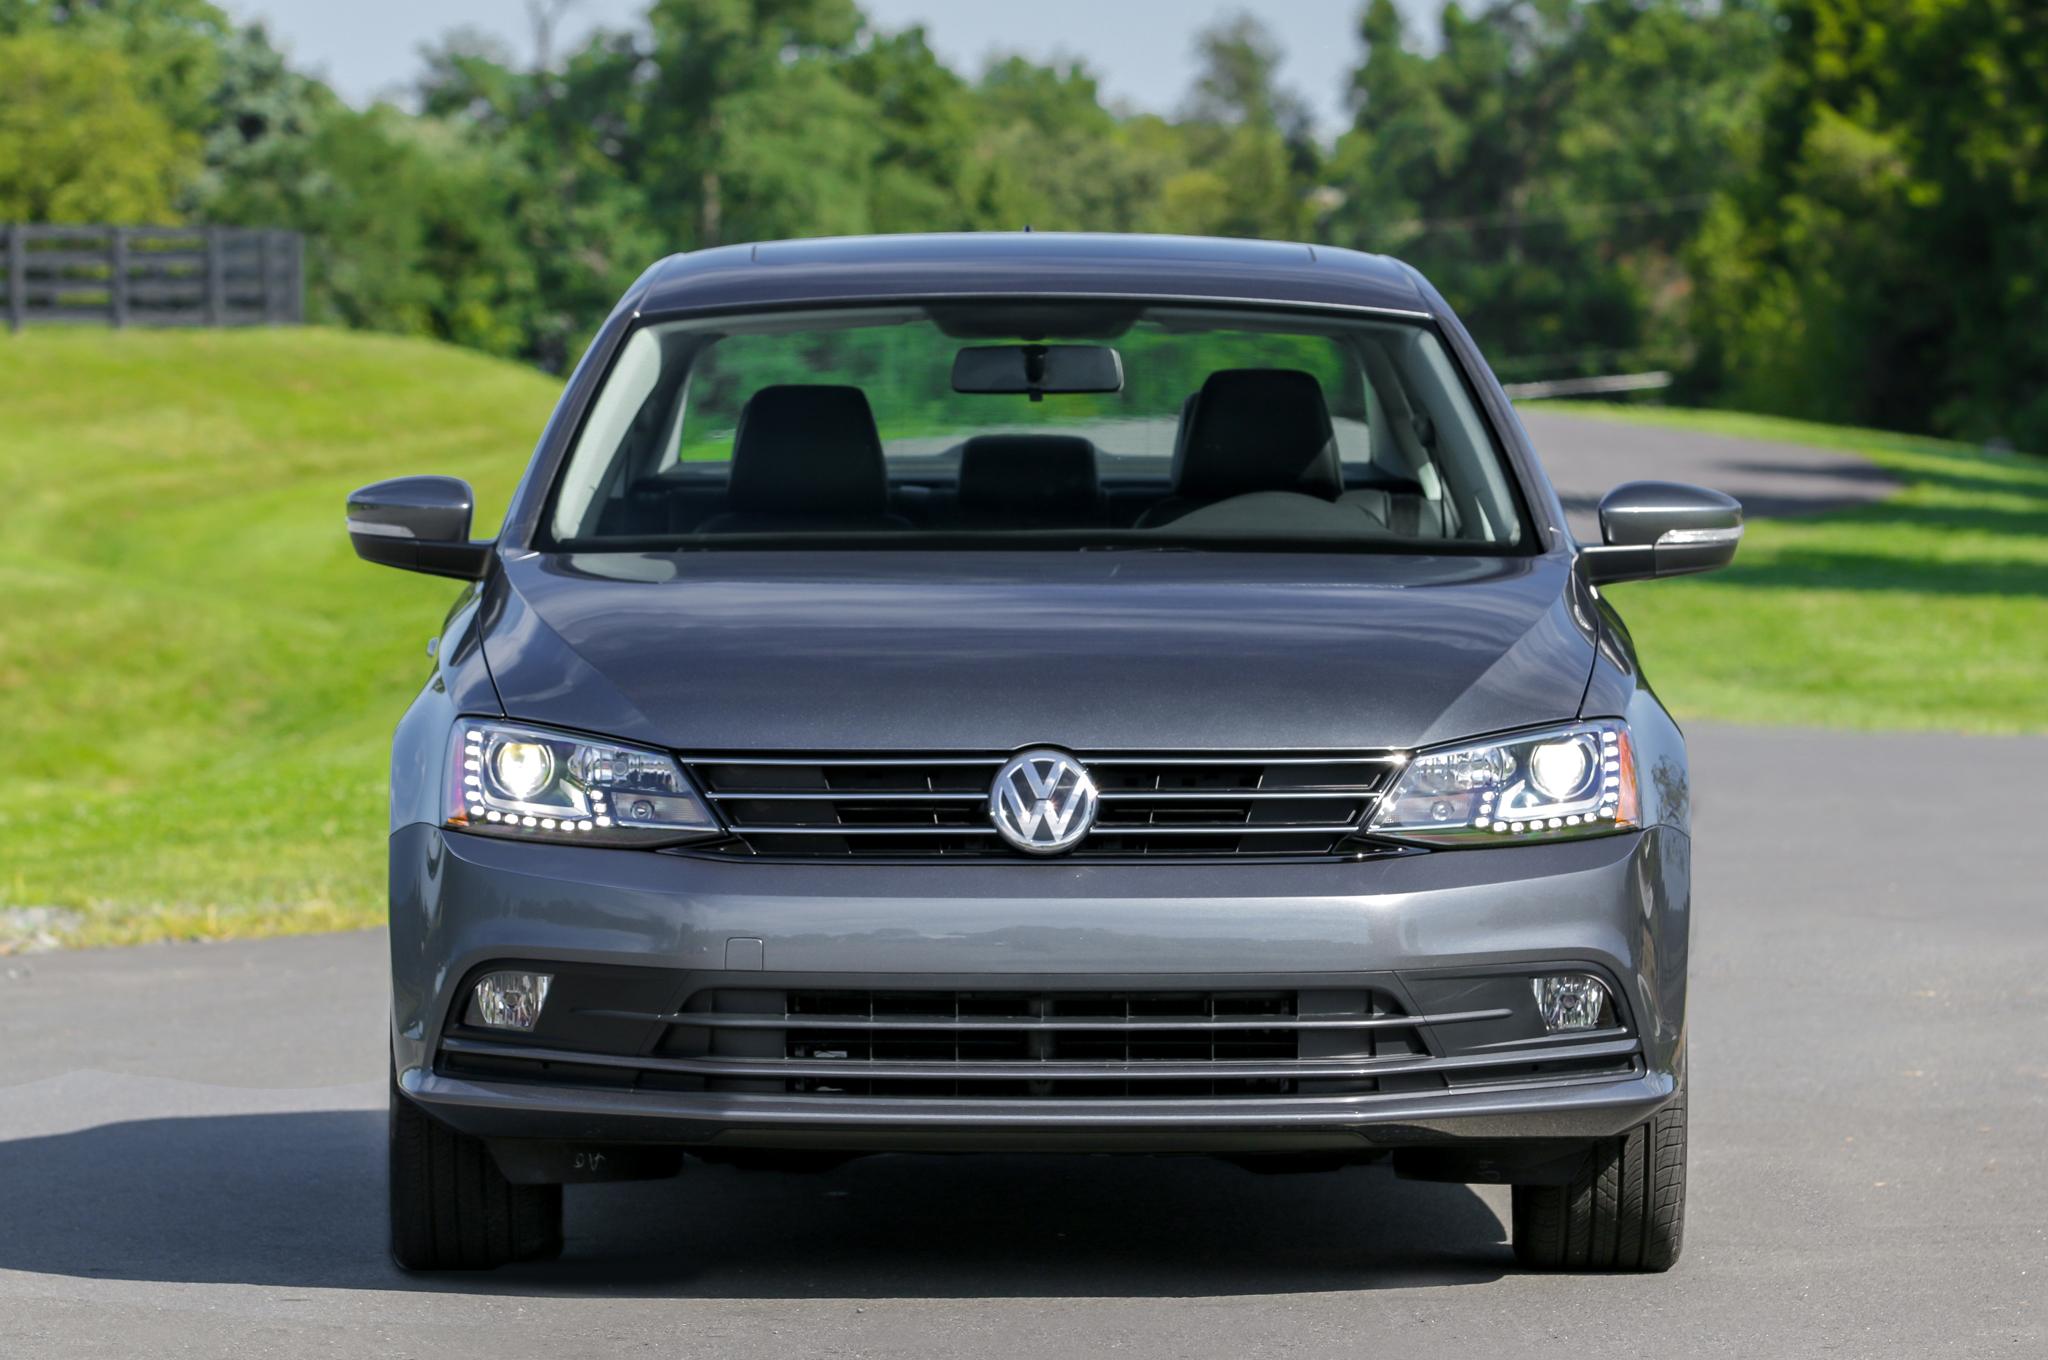 2017 Volkswagen Jetta Tsi Front End